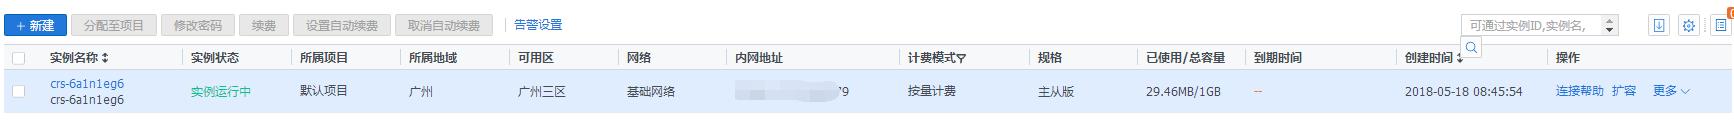 羊毛党之家 腾讯云云redis搭配wordpress使用  https://yangmaodang.org